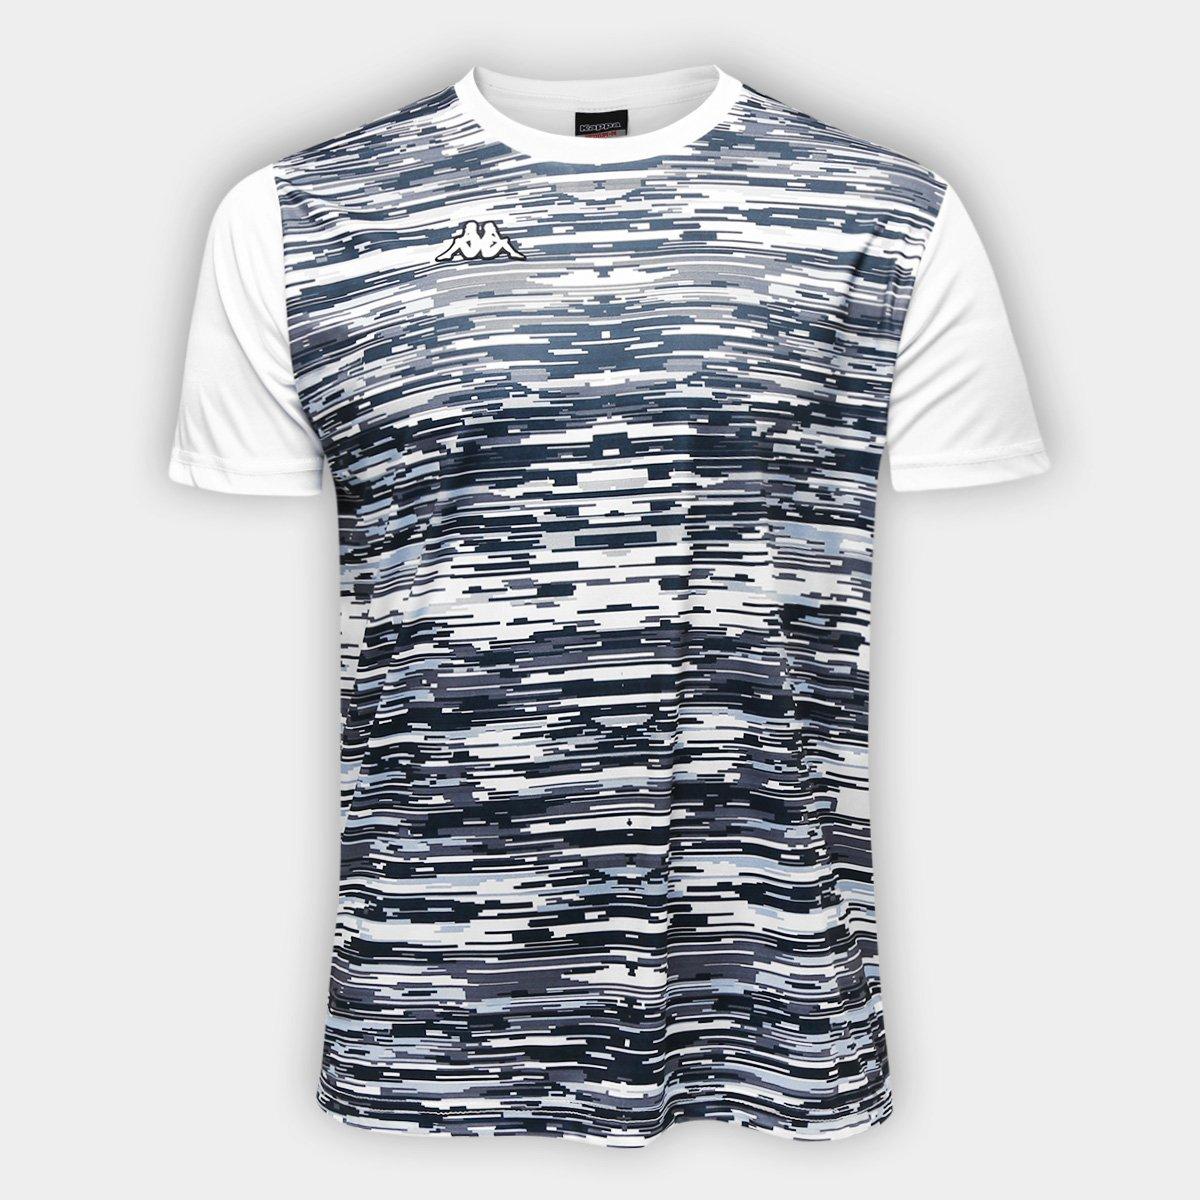 8757f30a56 Camiseta Kappa Jenner Masculina - Branco - Compre Agora